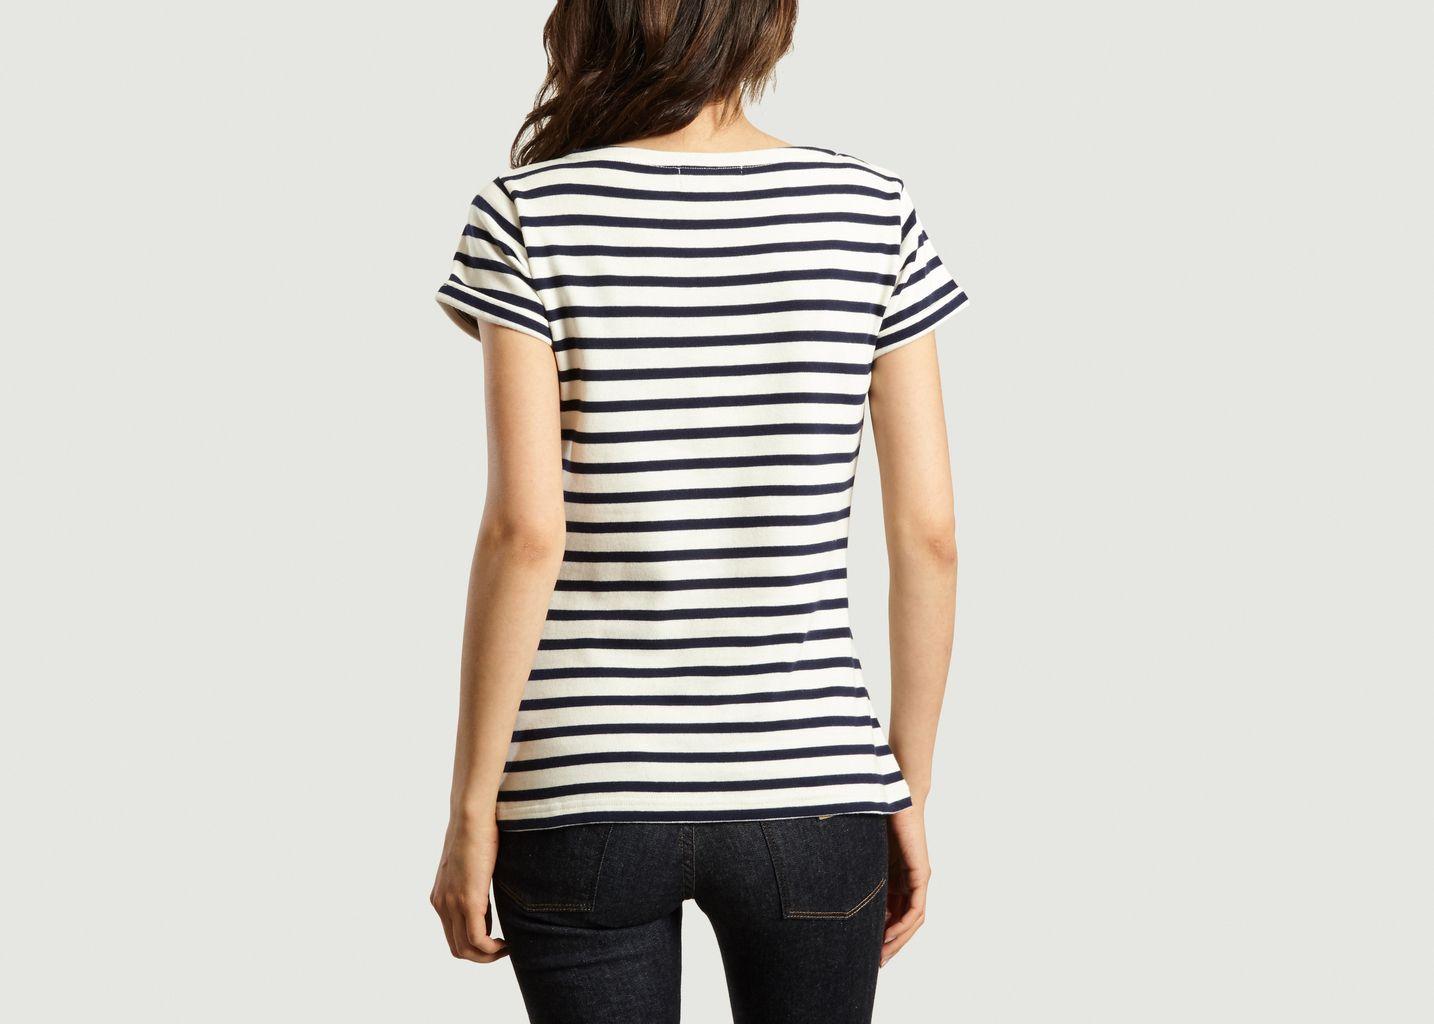 Tee-shirt Amour  - Maison Labiche